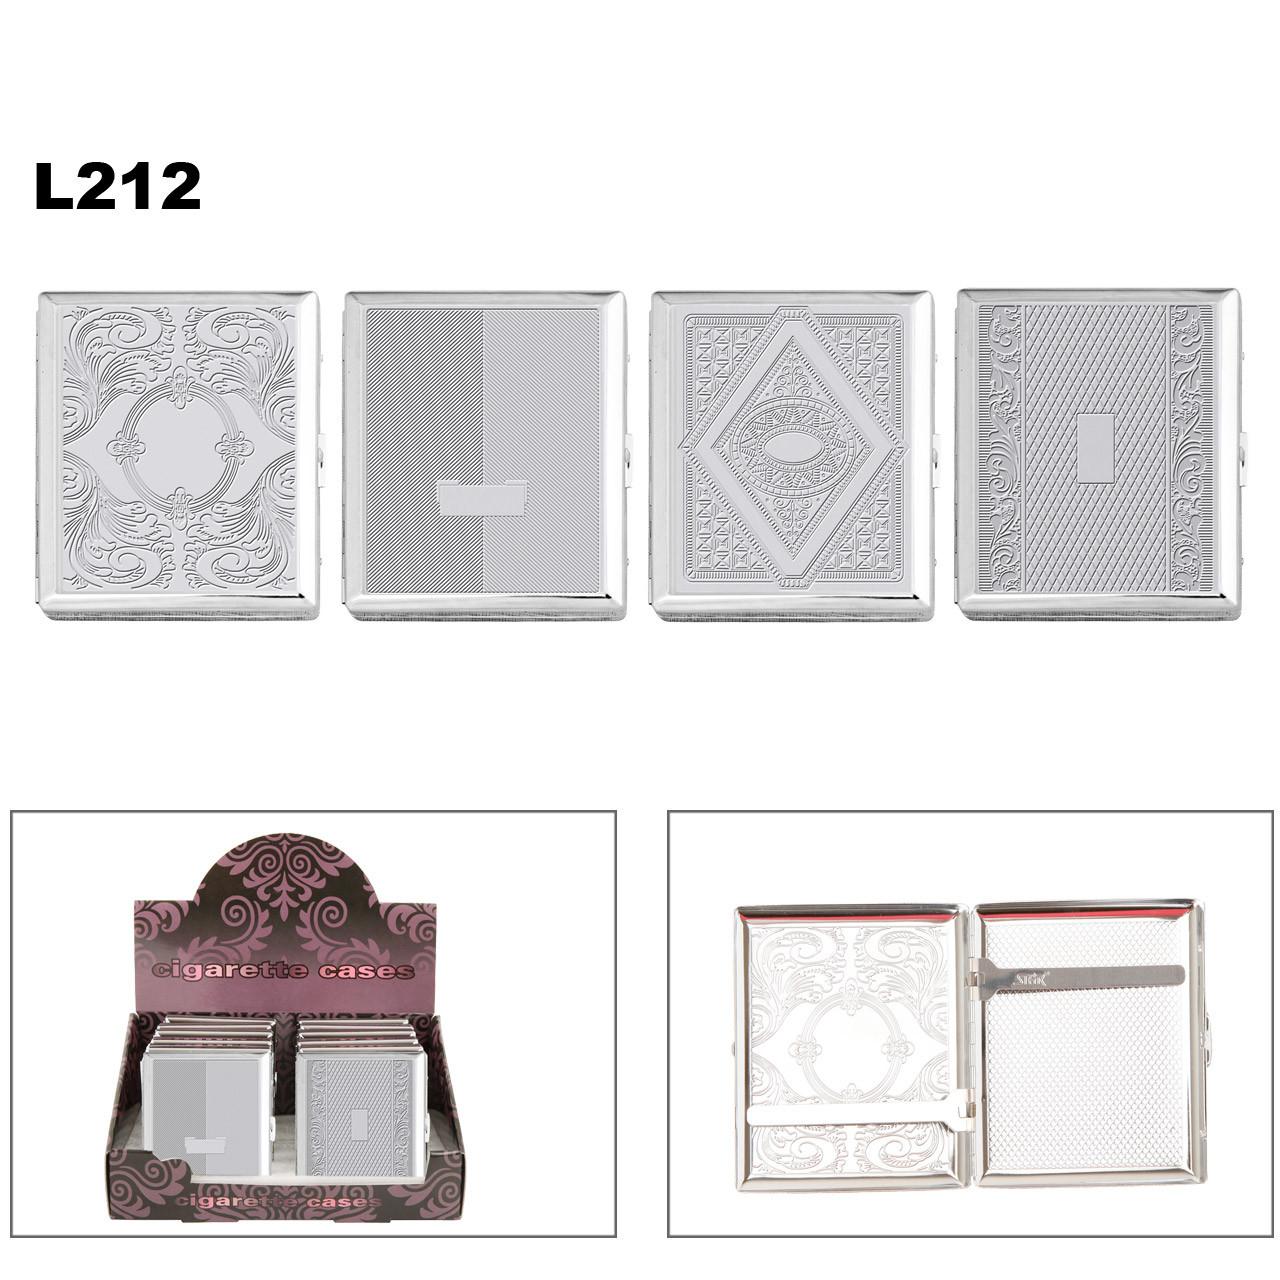 Polished Chrome Cigarette Cases L212